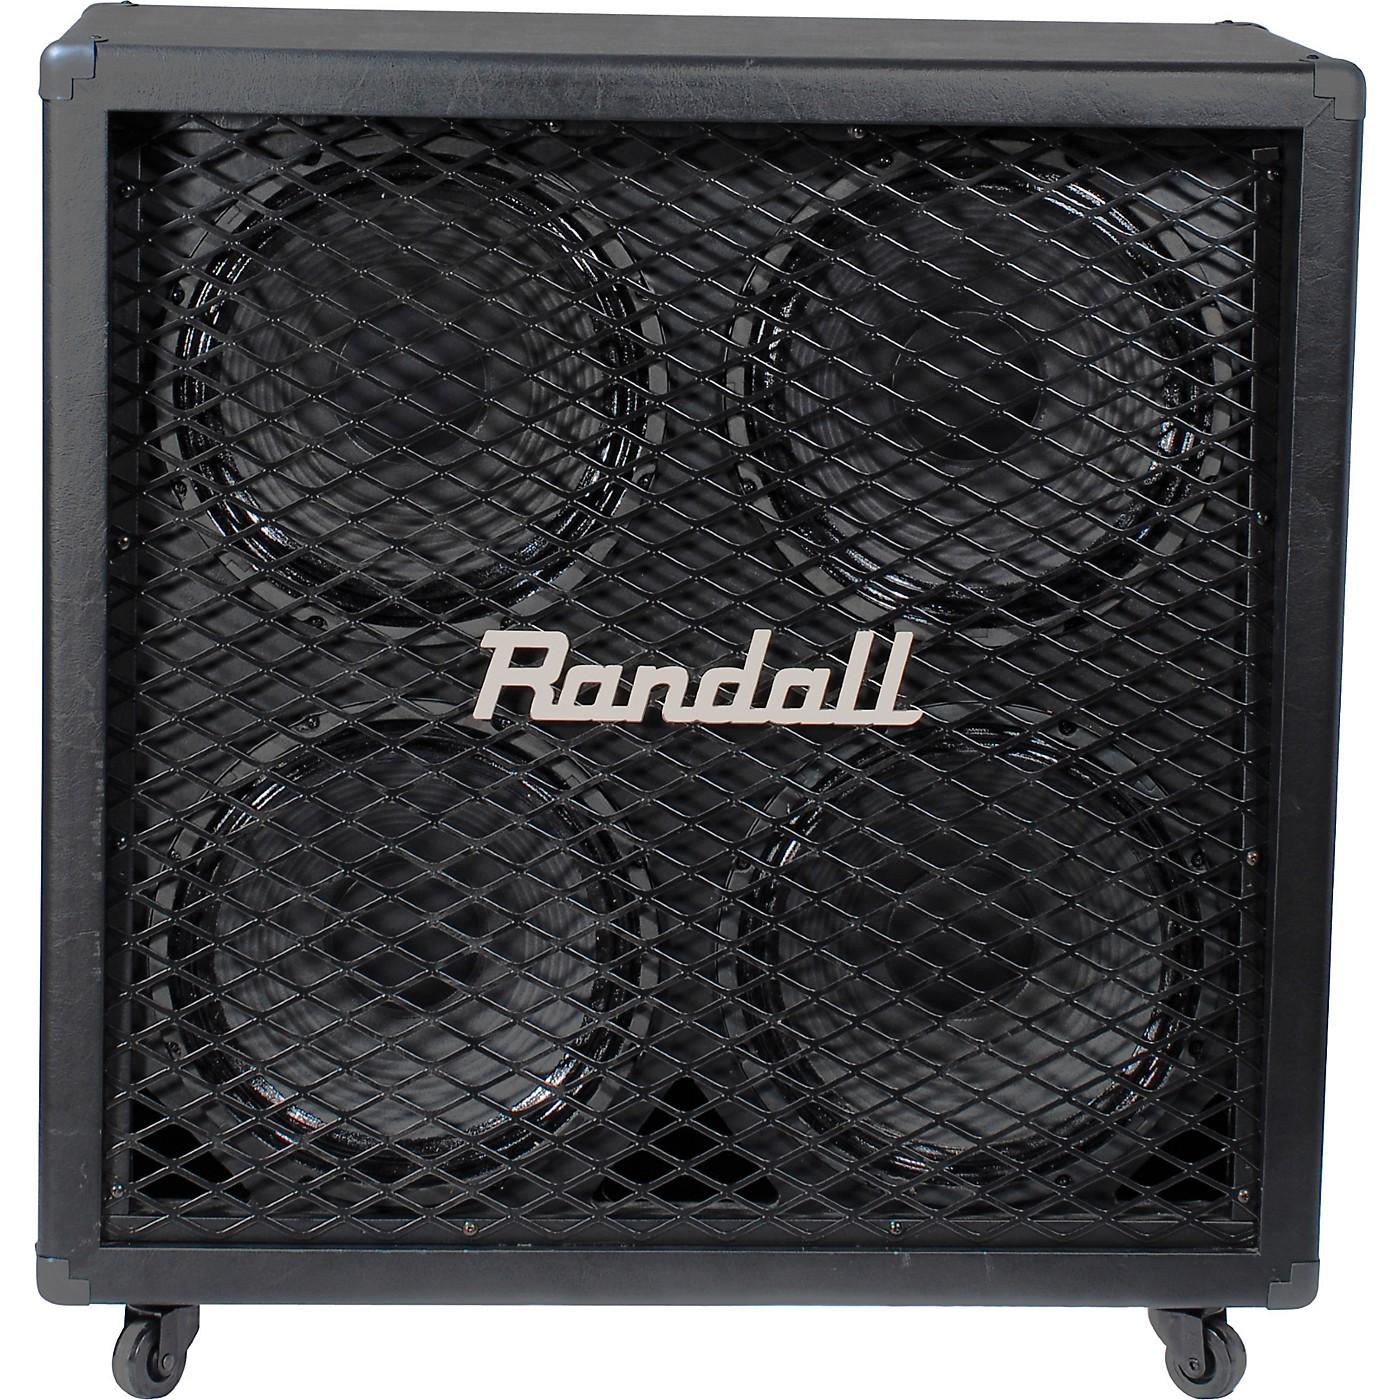 Randall RD412-V30 Diavlo 4x12 Angled Guitar Cab thumbnail